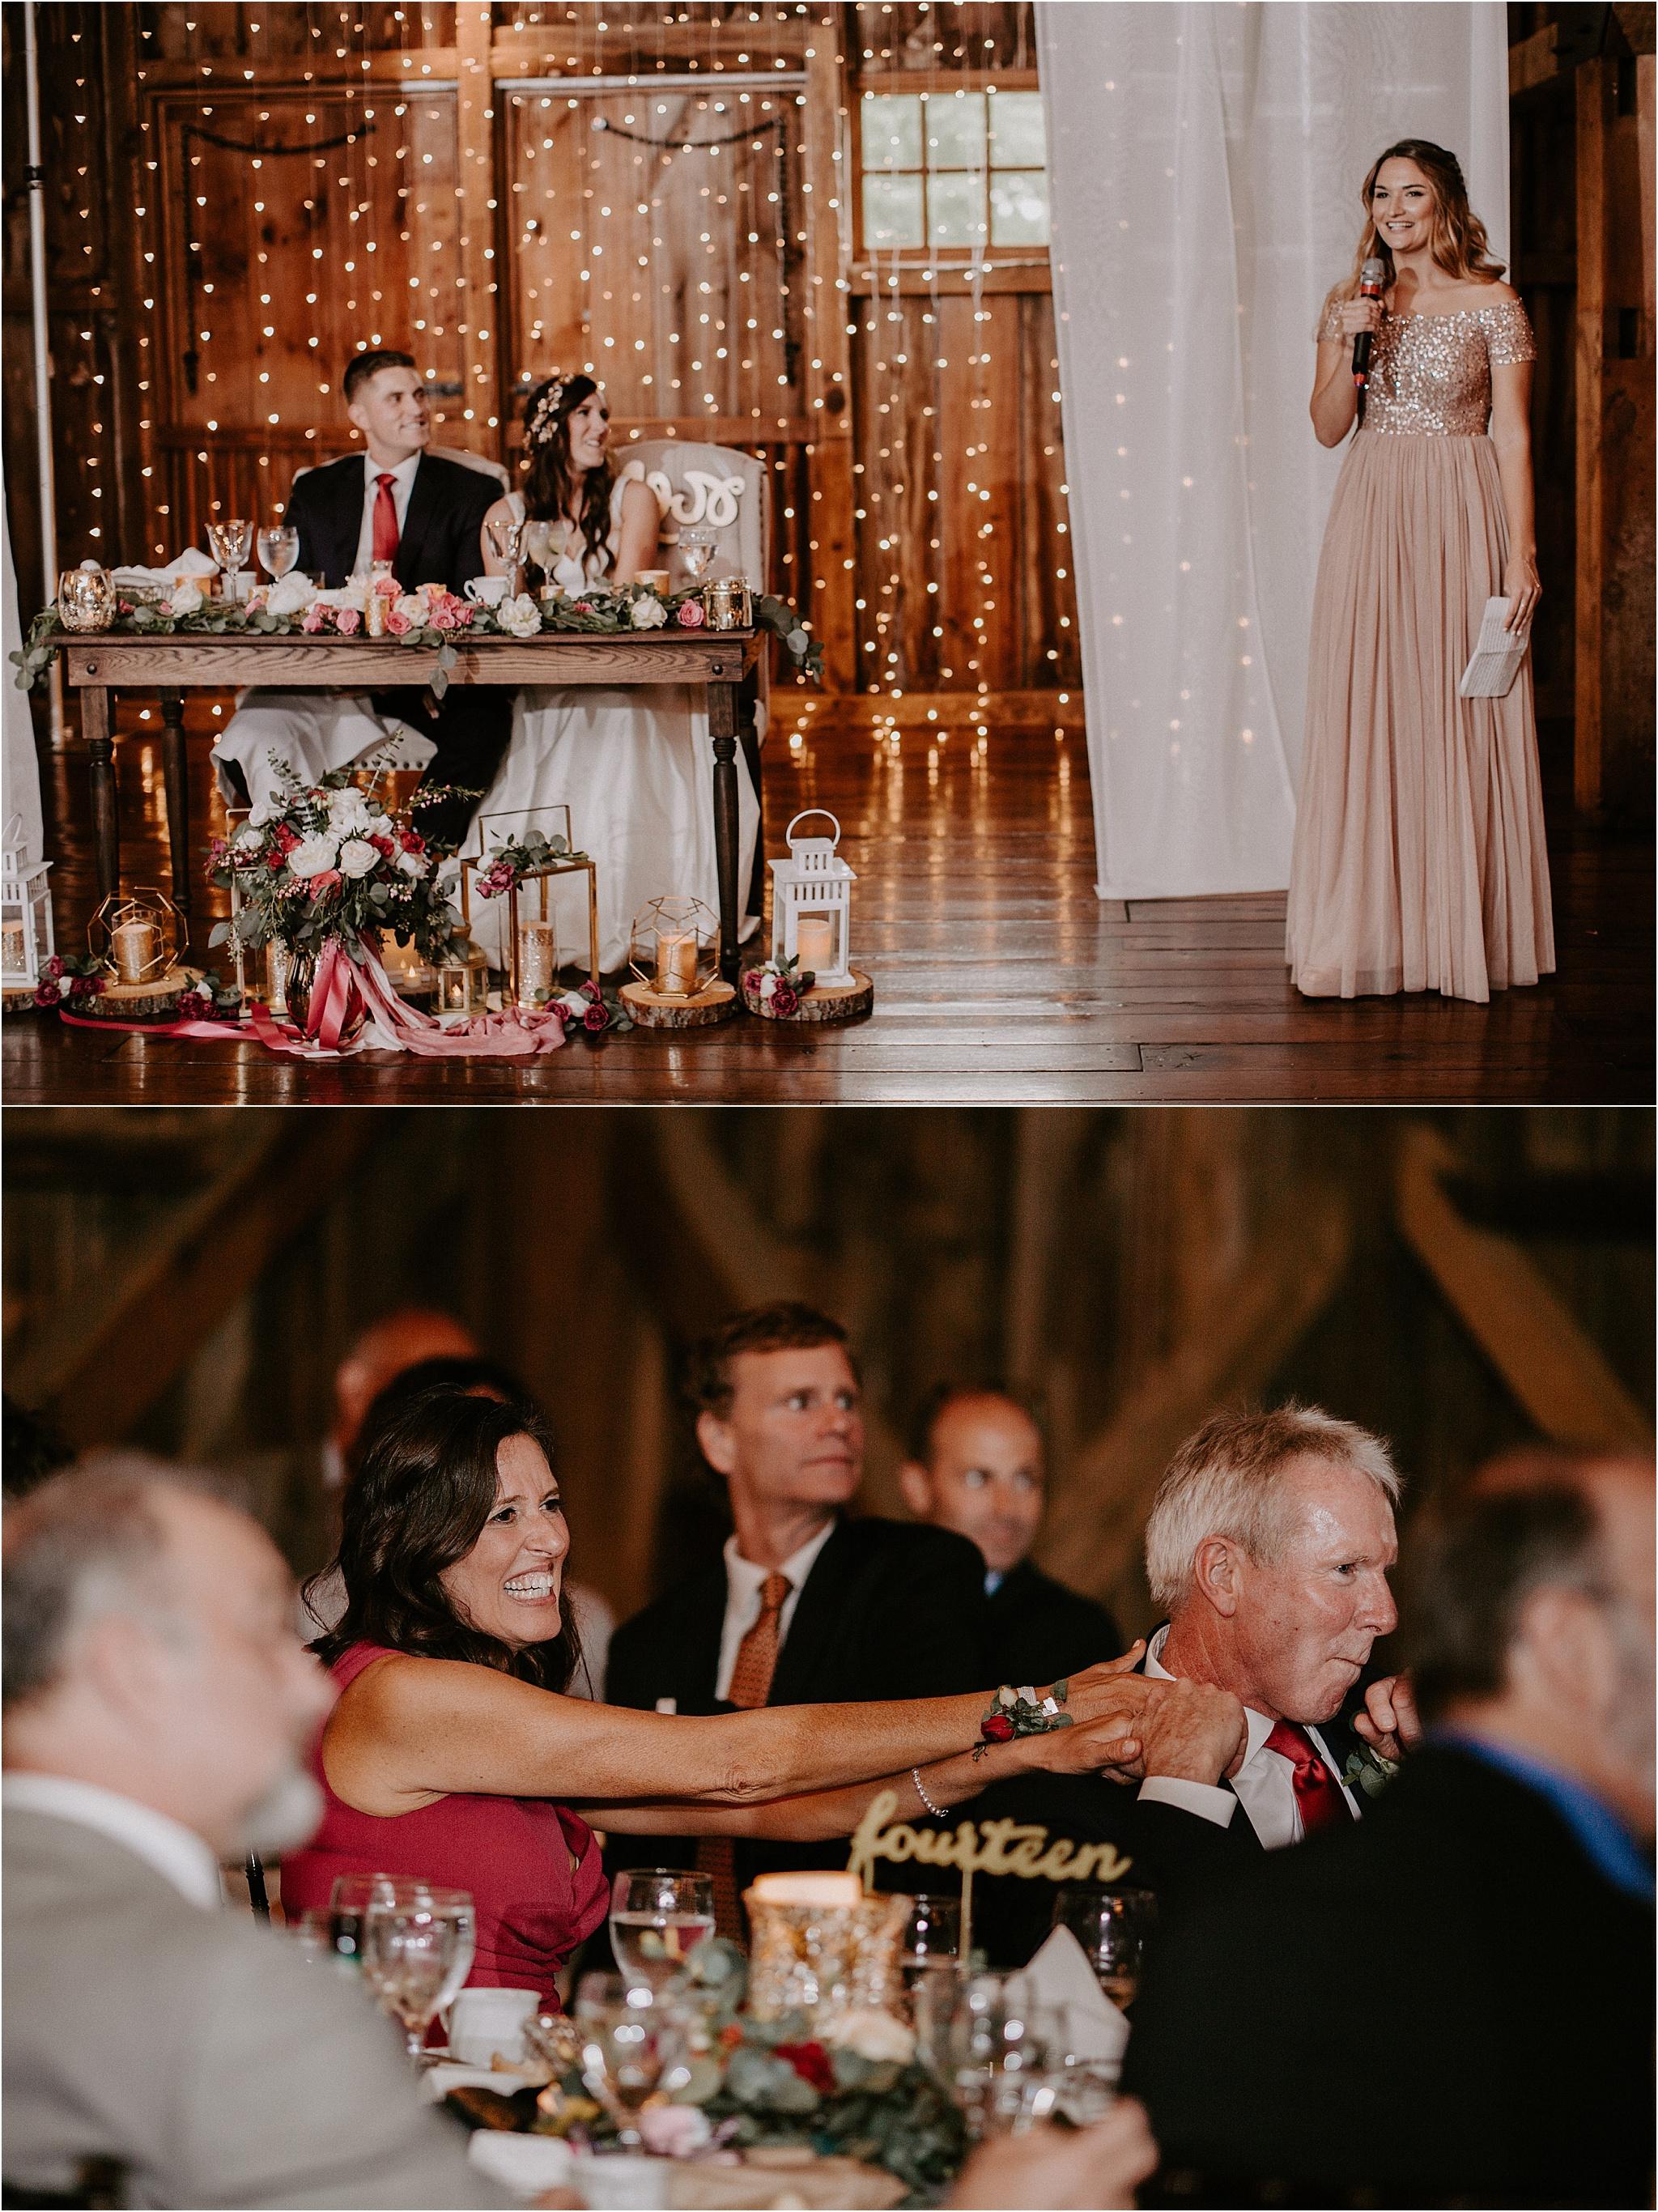 Sarah_Brookhart_Farm_at_Eagles_Ridge_Wedding_Photographer_0057.jpg